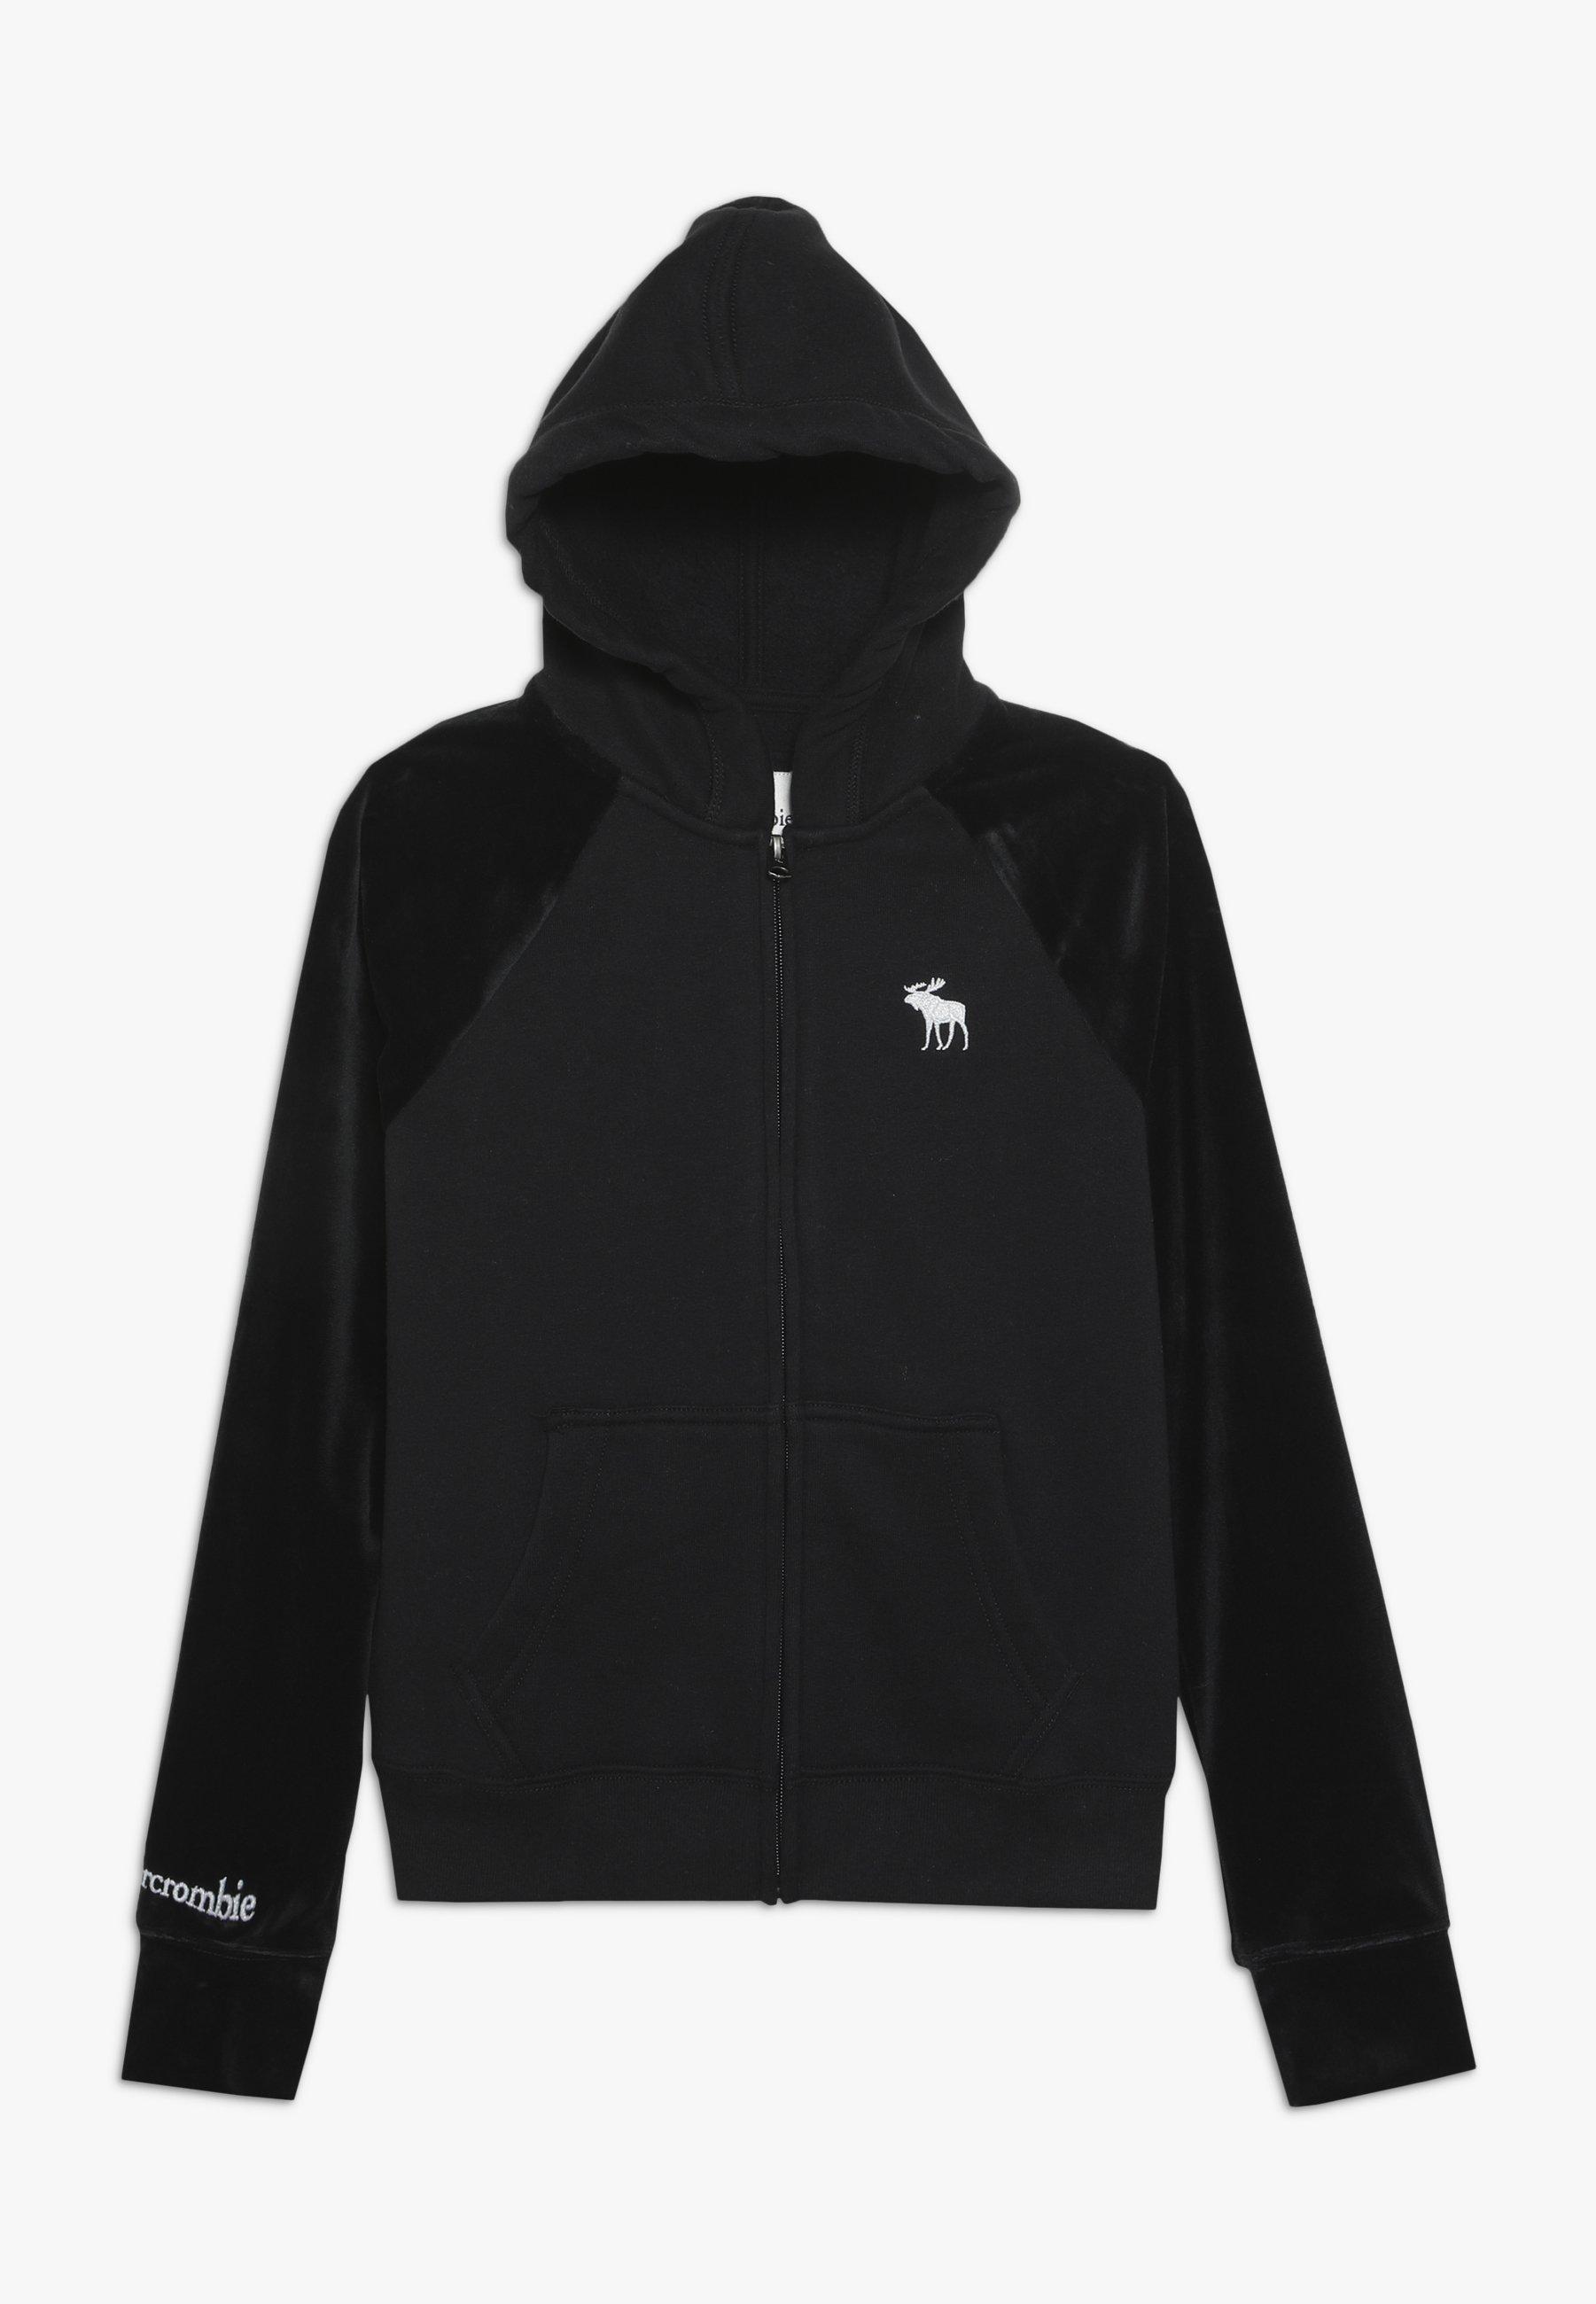 Große Förderung Abercrombie & Fitch CORE - Sweatjacke - black | Damenbekleidung 2020